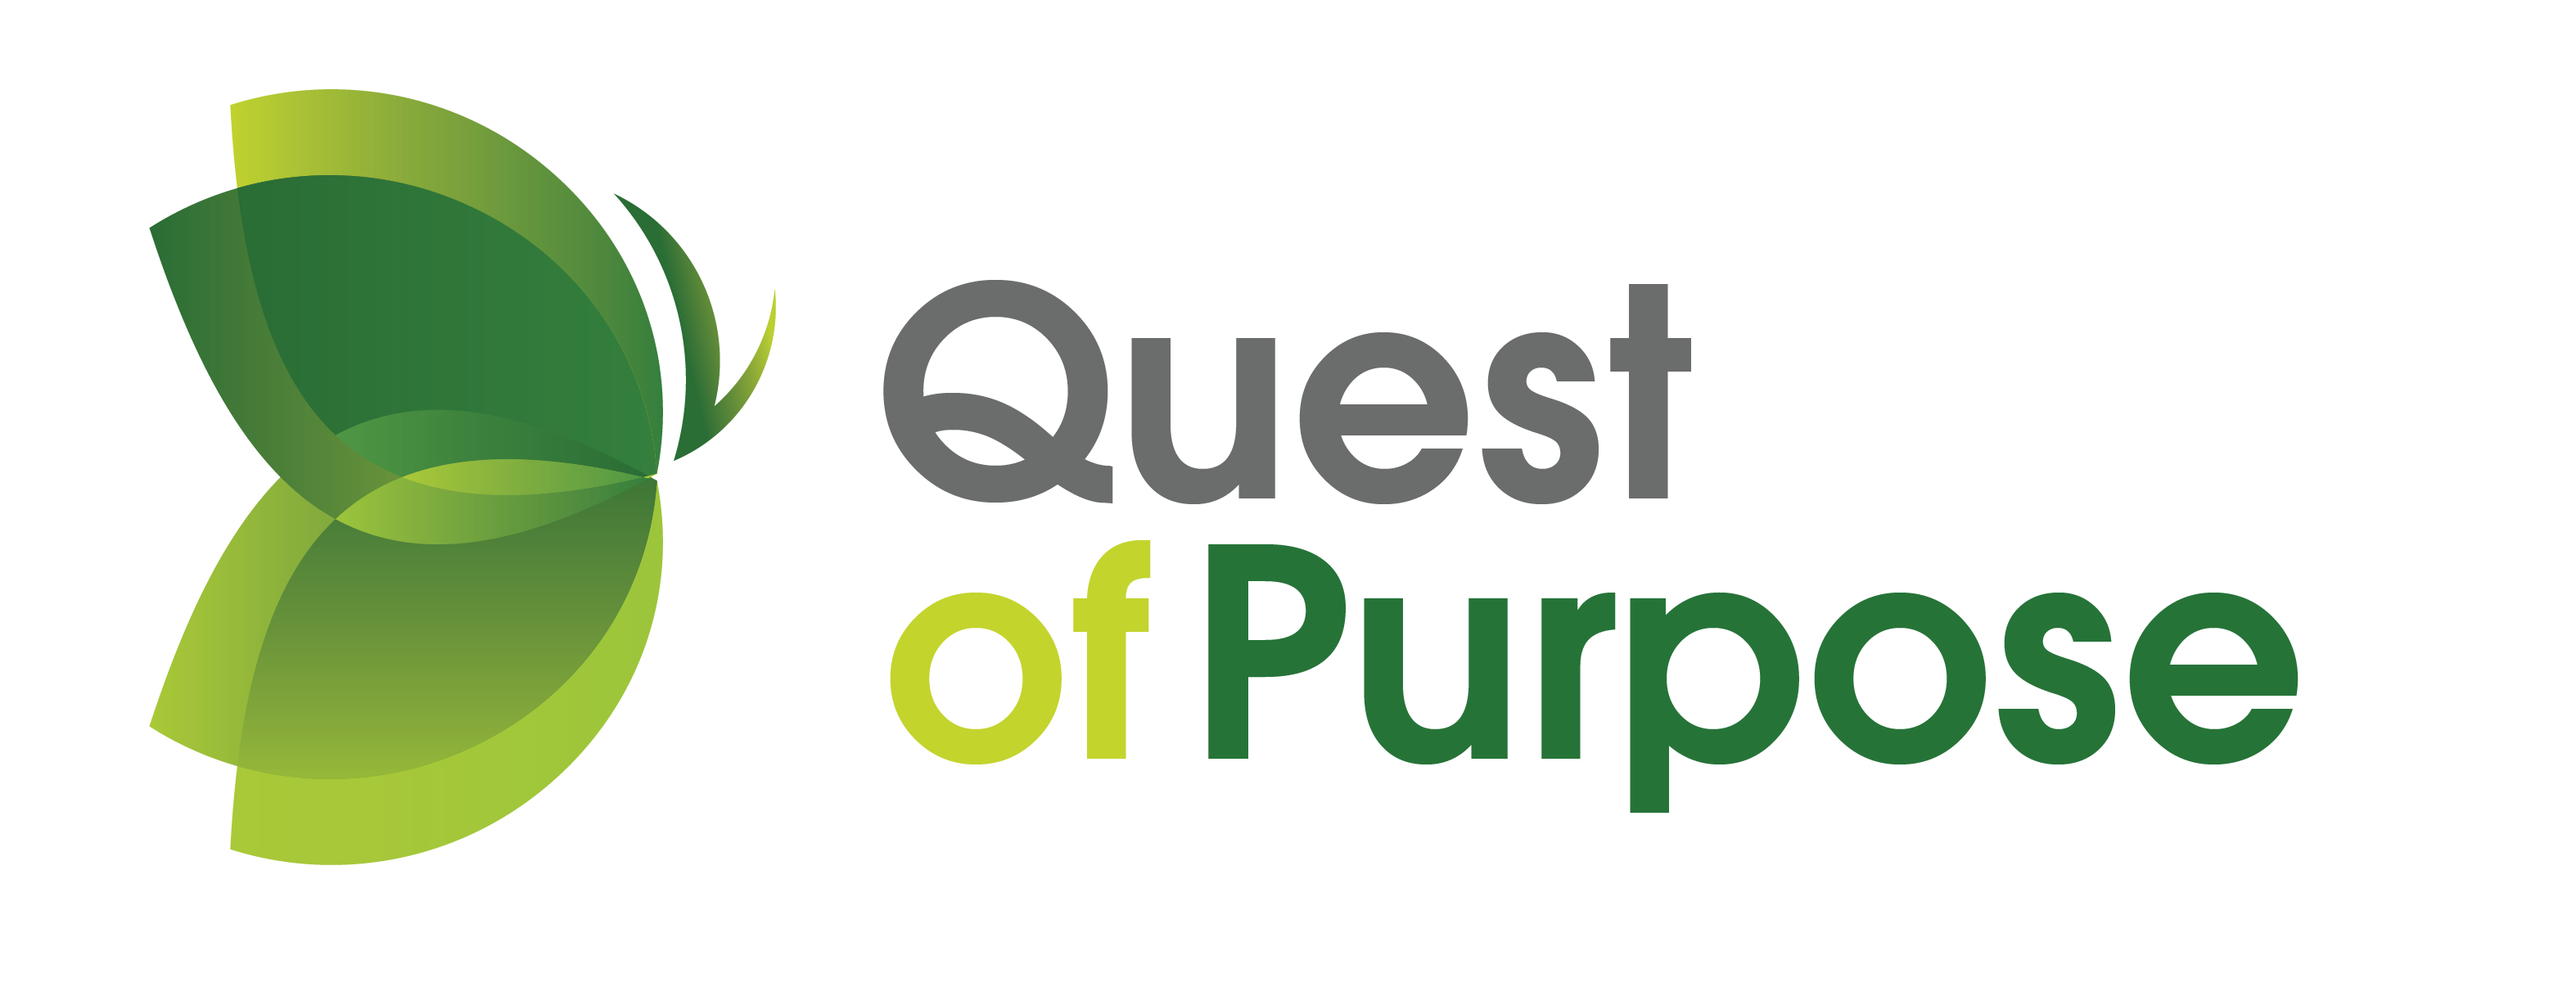 QuestofPurpose-Assets-02-1.png